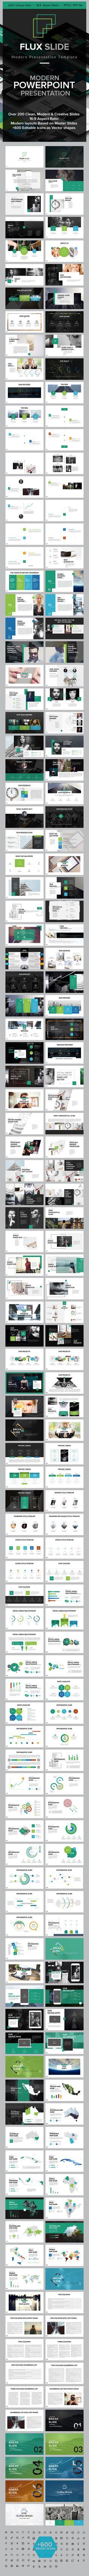 Flux Slides PowerPoint Template. Download here: http://graphicriver.net/item/flux-slides-powerpoint-template/16251740?ref=ksioks